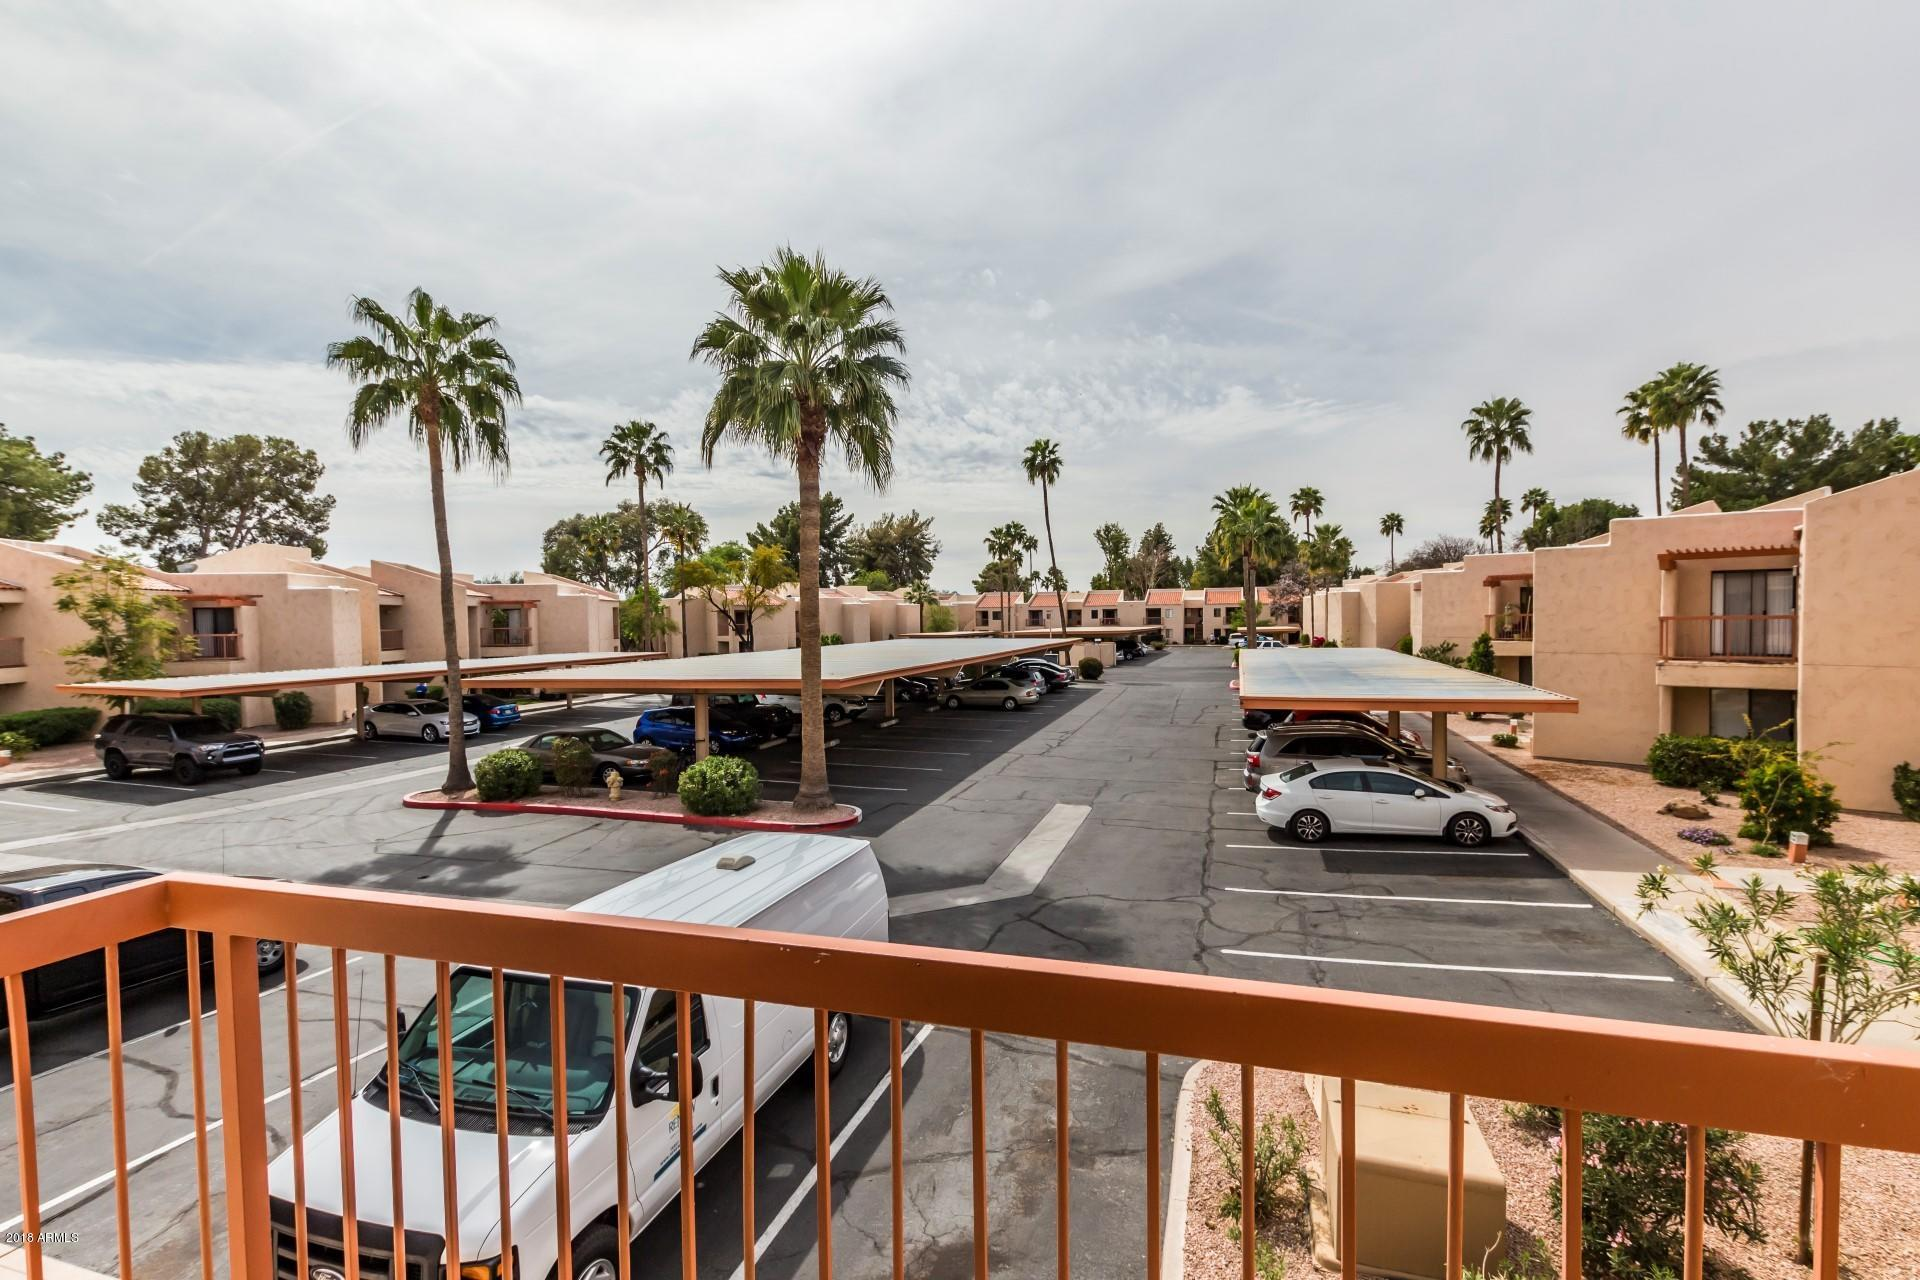 9345 N 92ND Street Unit 212 Scottsdale, AZ 85258 - MLS #: 5853987